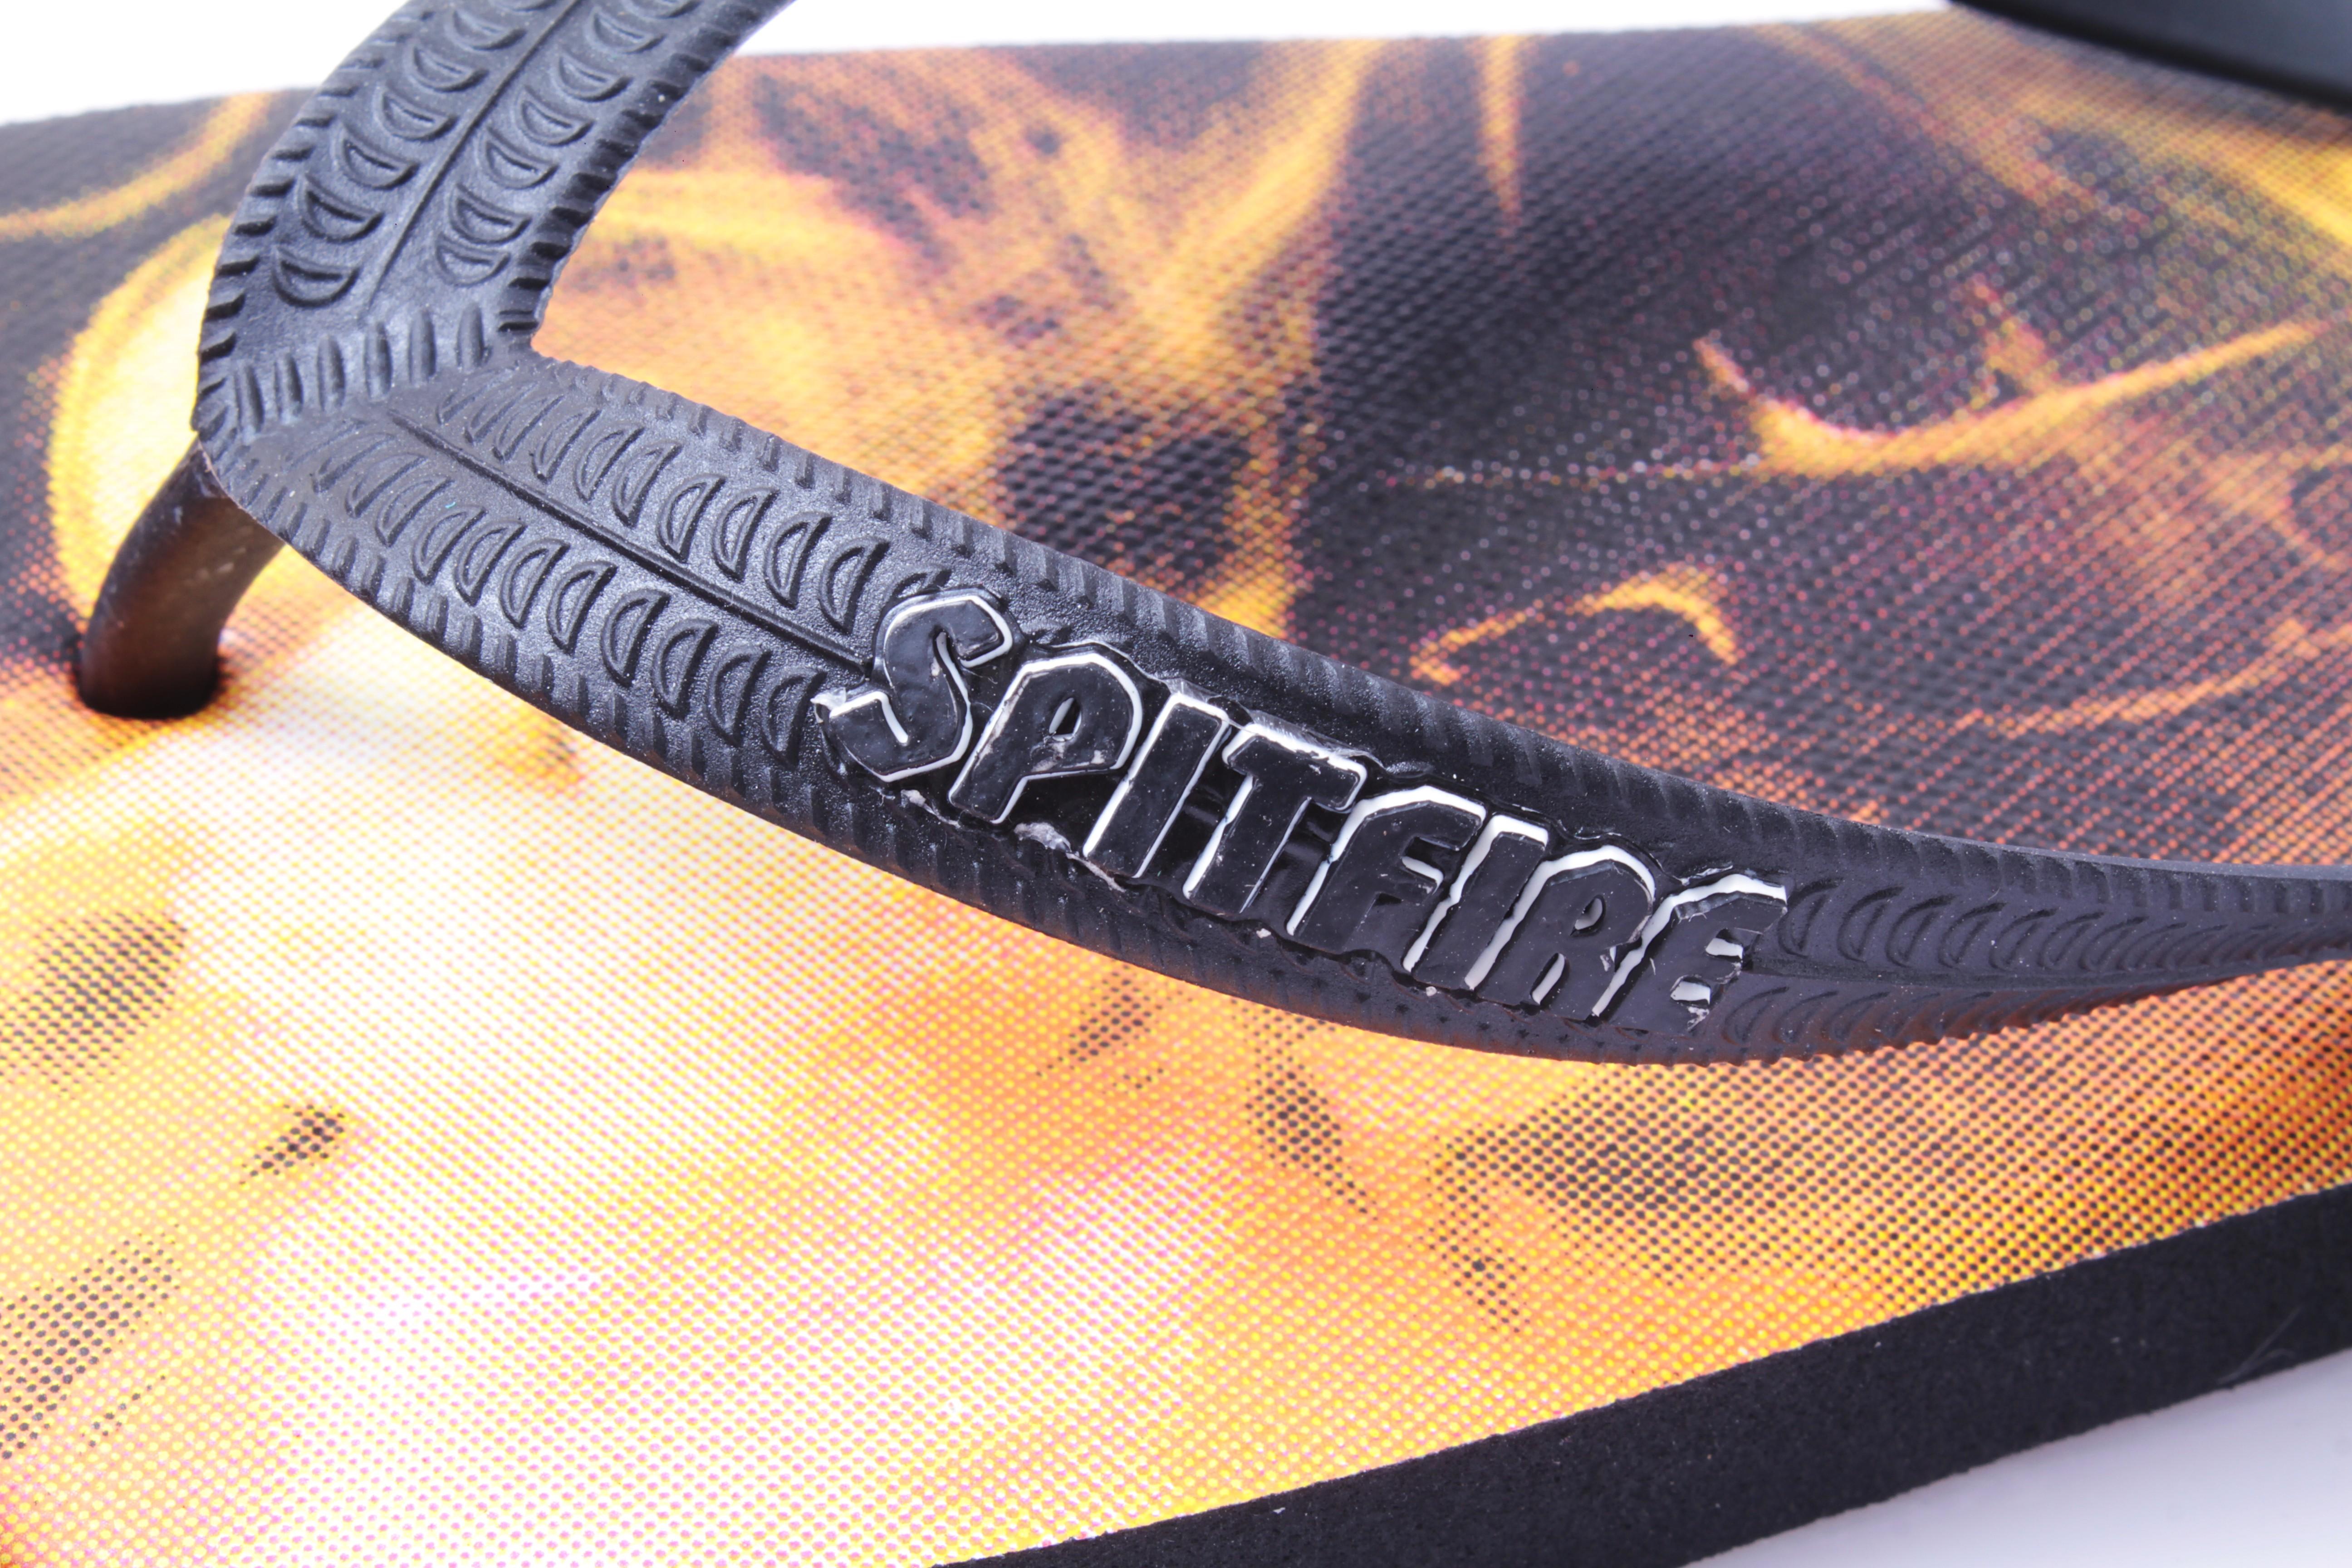 Sandalias de Hombre Fire Strap Spitfire multicolor